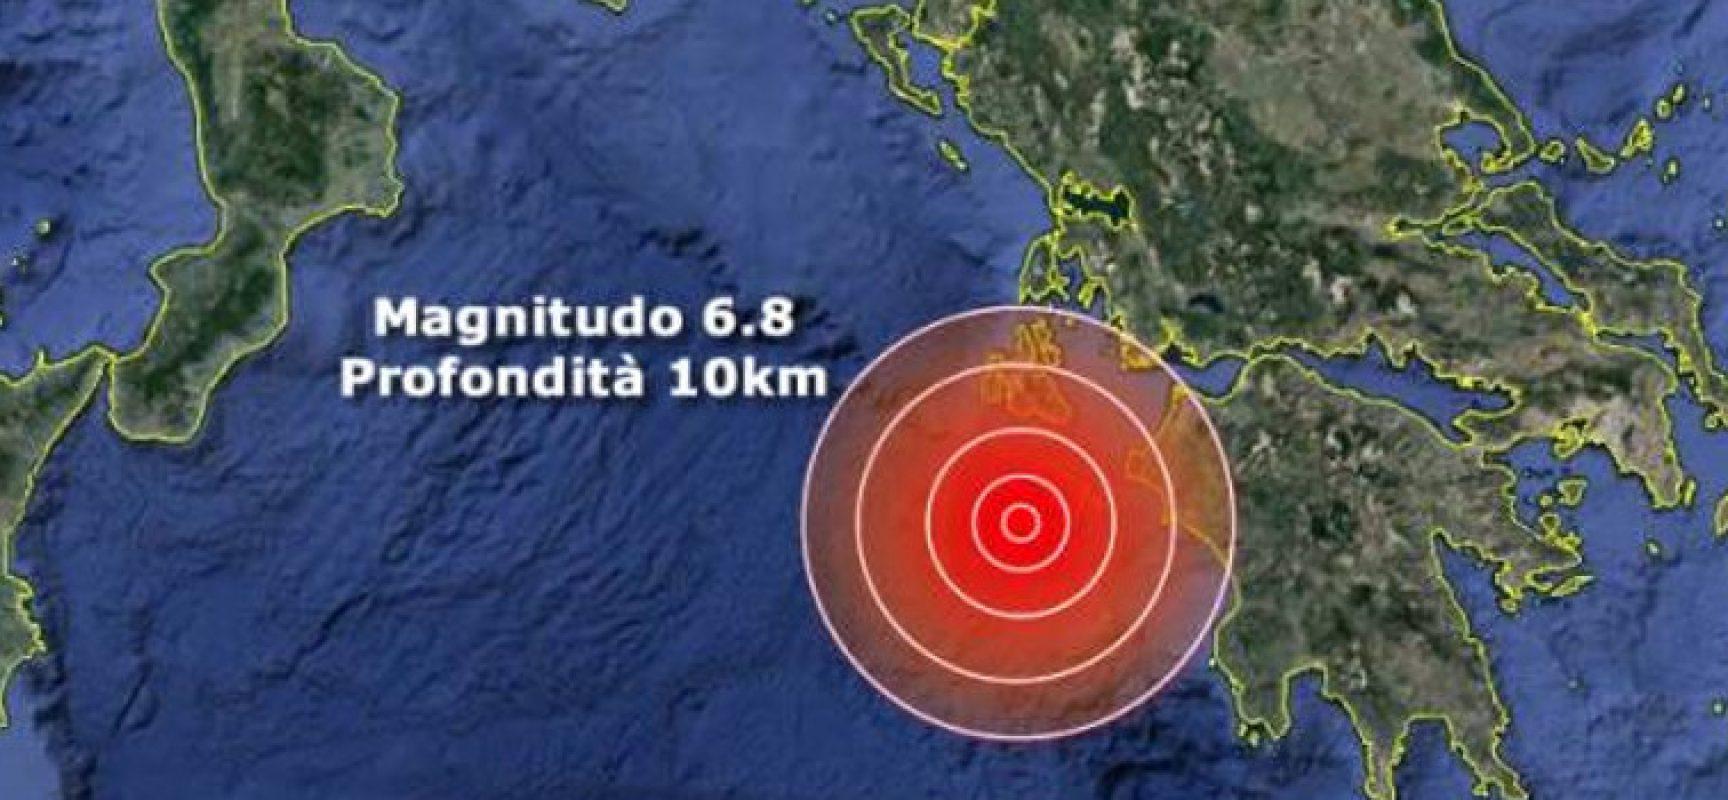 Lunga scossa di terremoto nella notte avvertita a Bisceglie